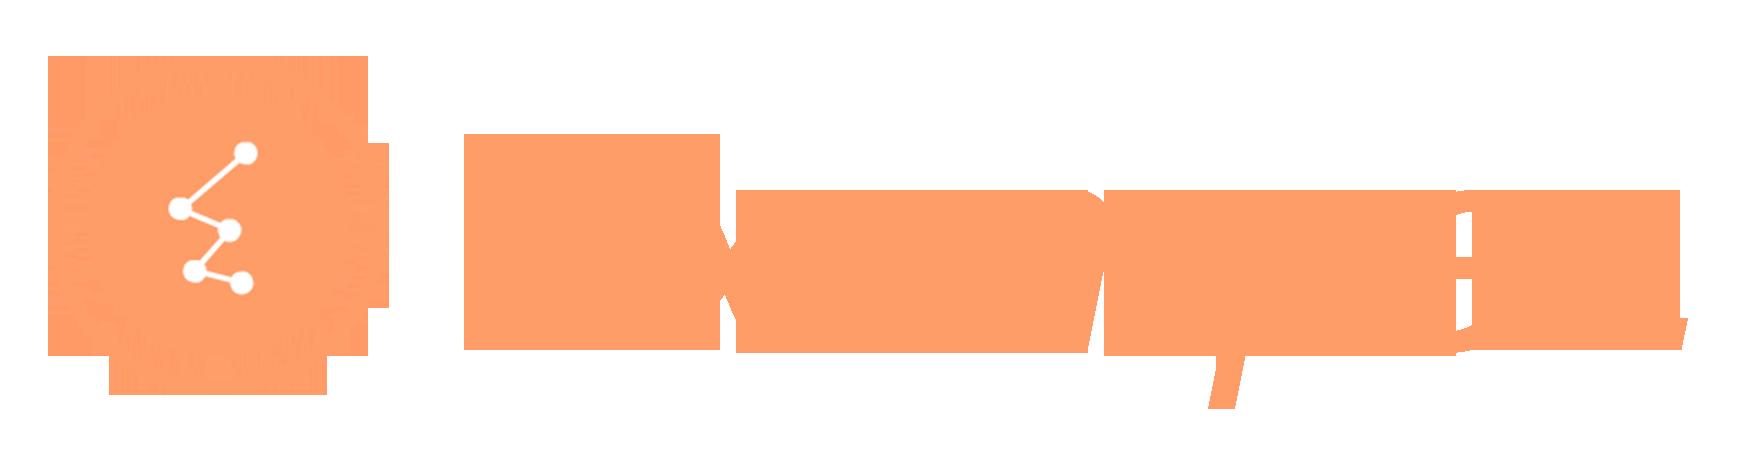 Examper